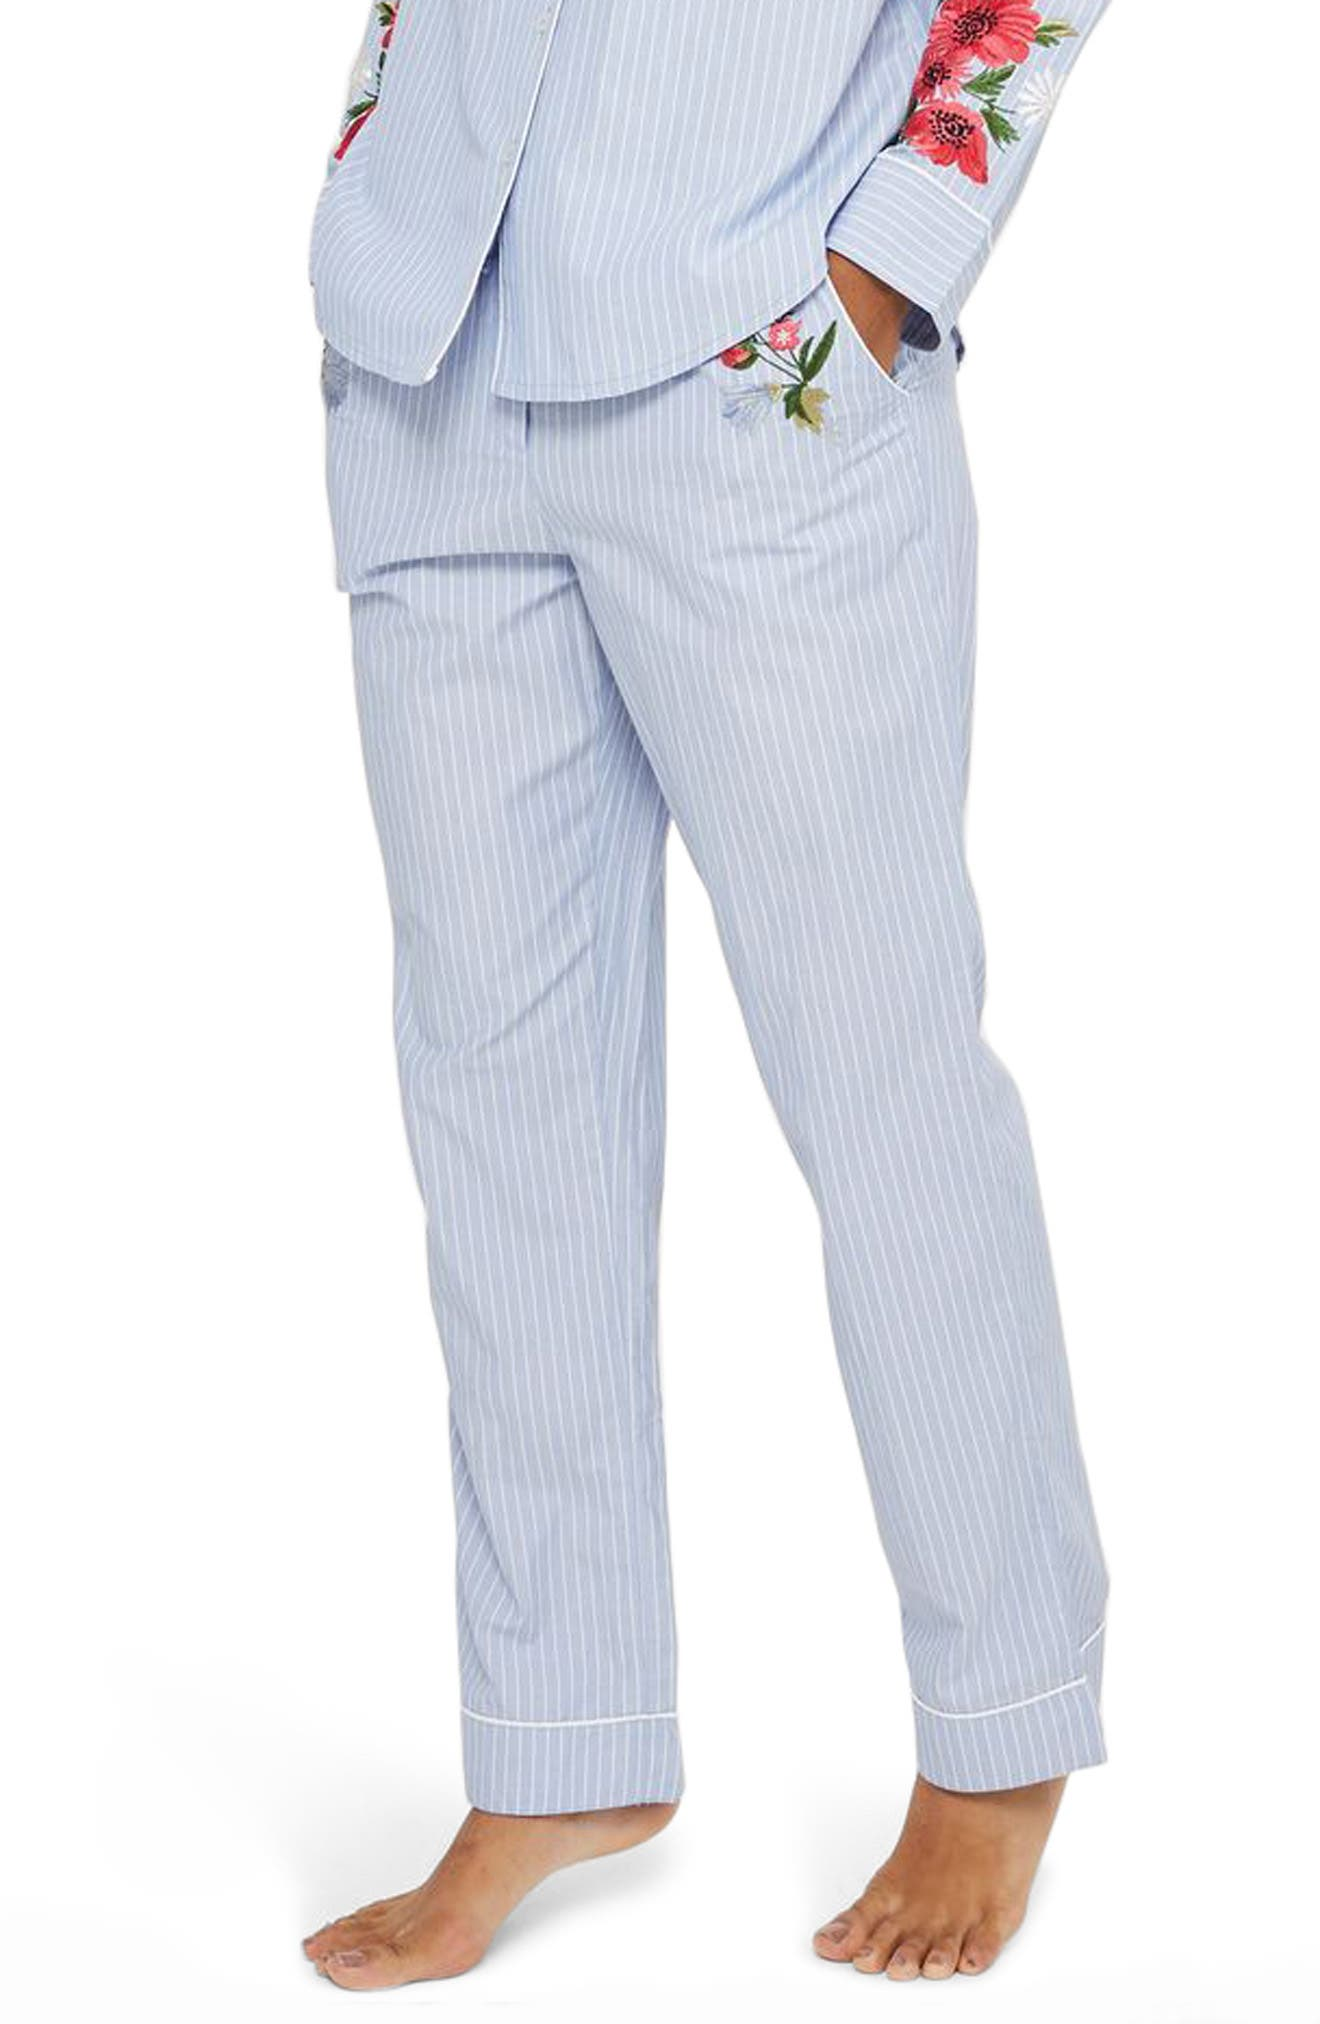 Main Image - Topshop Floral Embroidered Stripe Pajama Pants